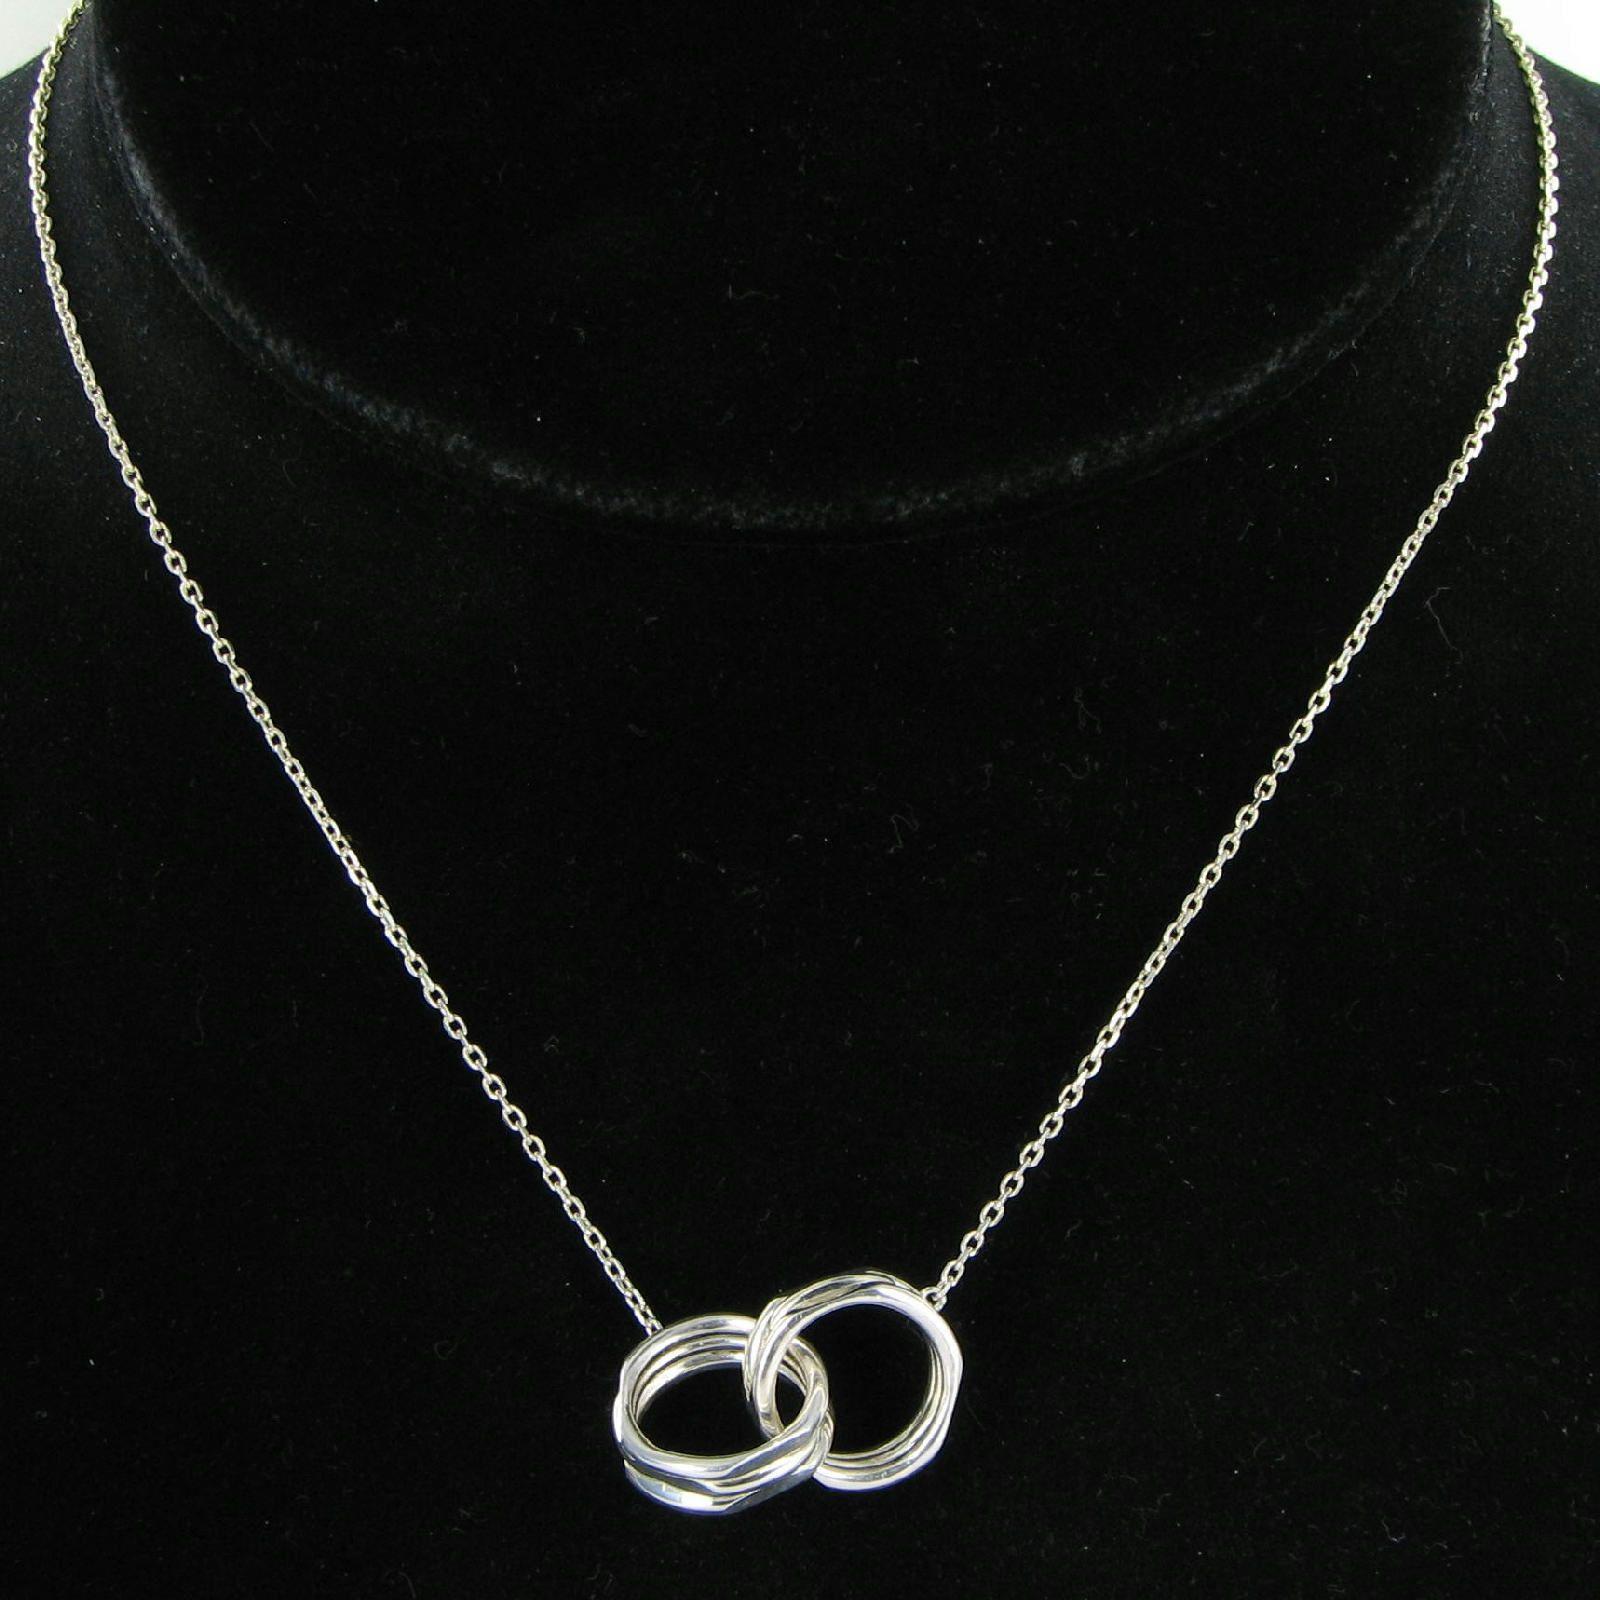 d1cbdae98de4 Links of London 5020.1364 Necklace 20/20 Interlock 45cm Sterling Silver New  $225 For Sale - Item #1704064